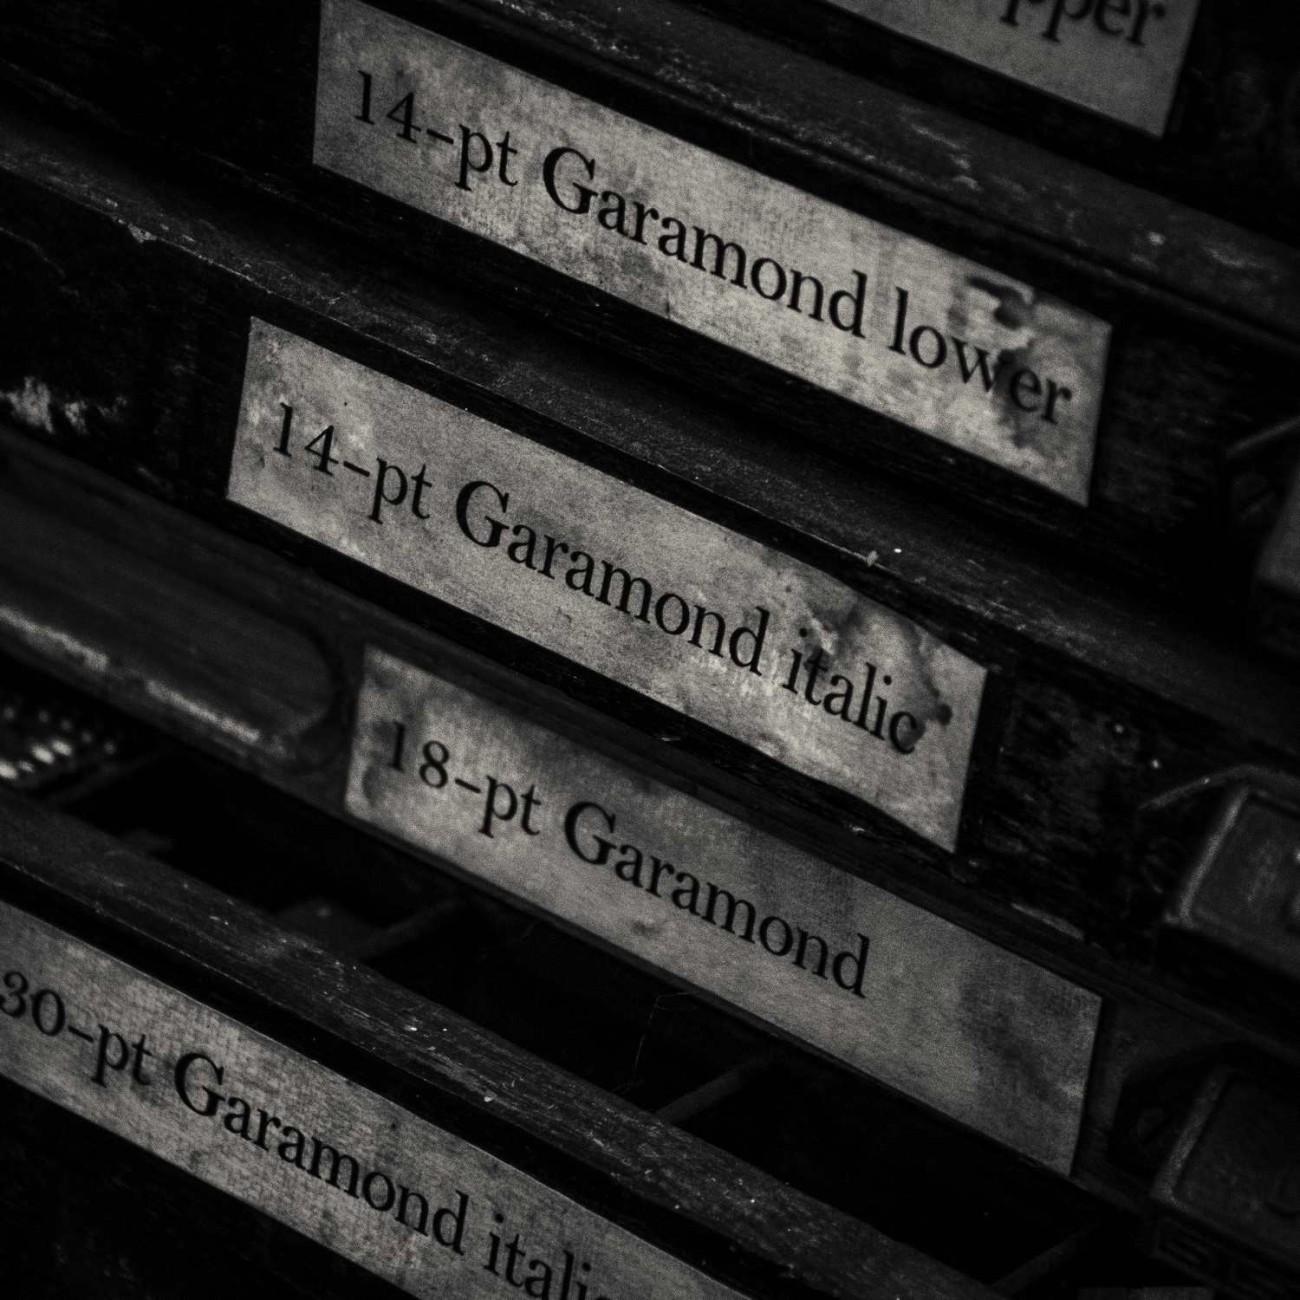 Garamond type trays, England, 2010